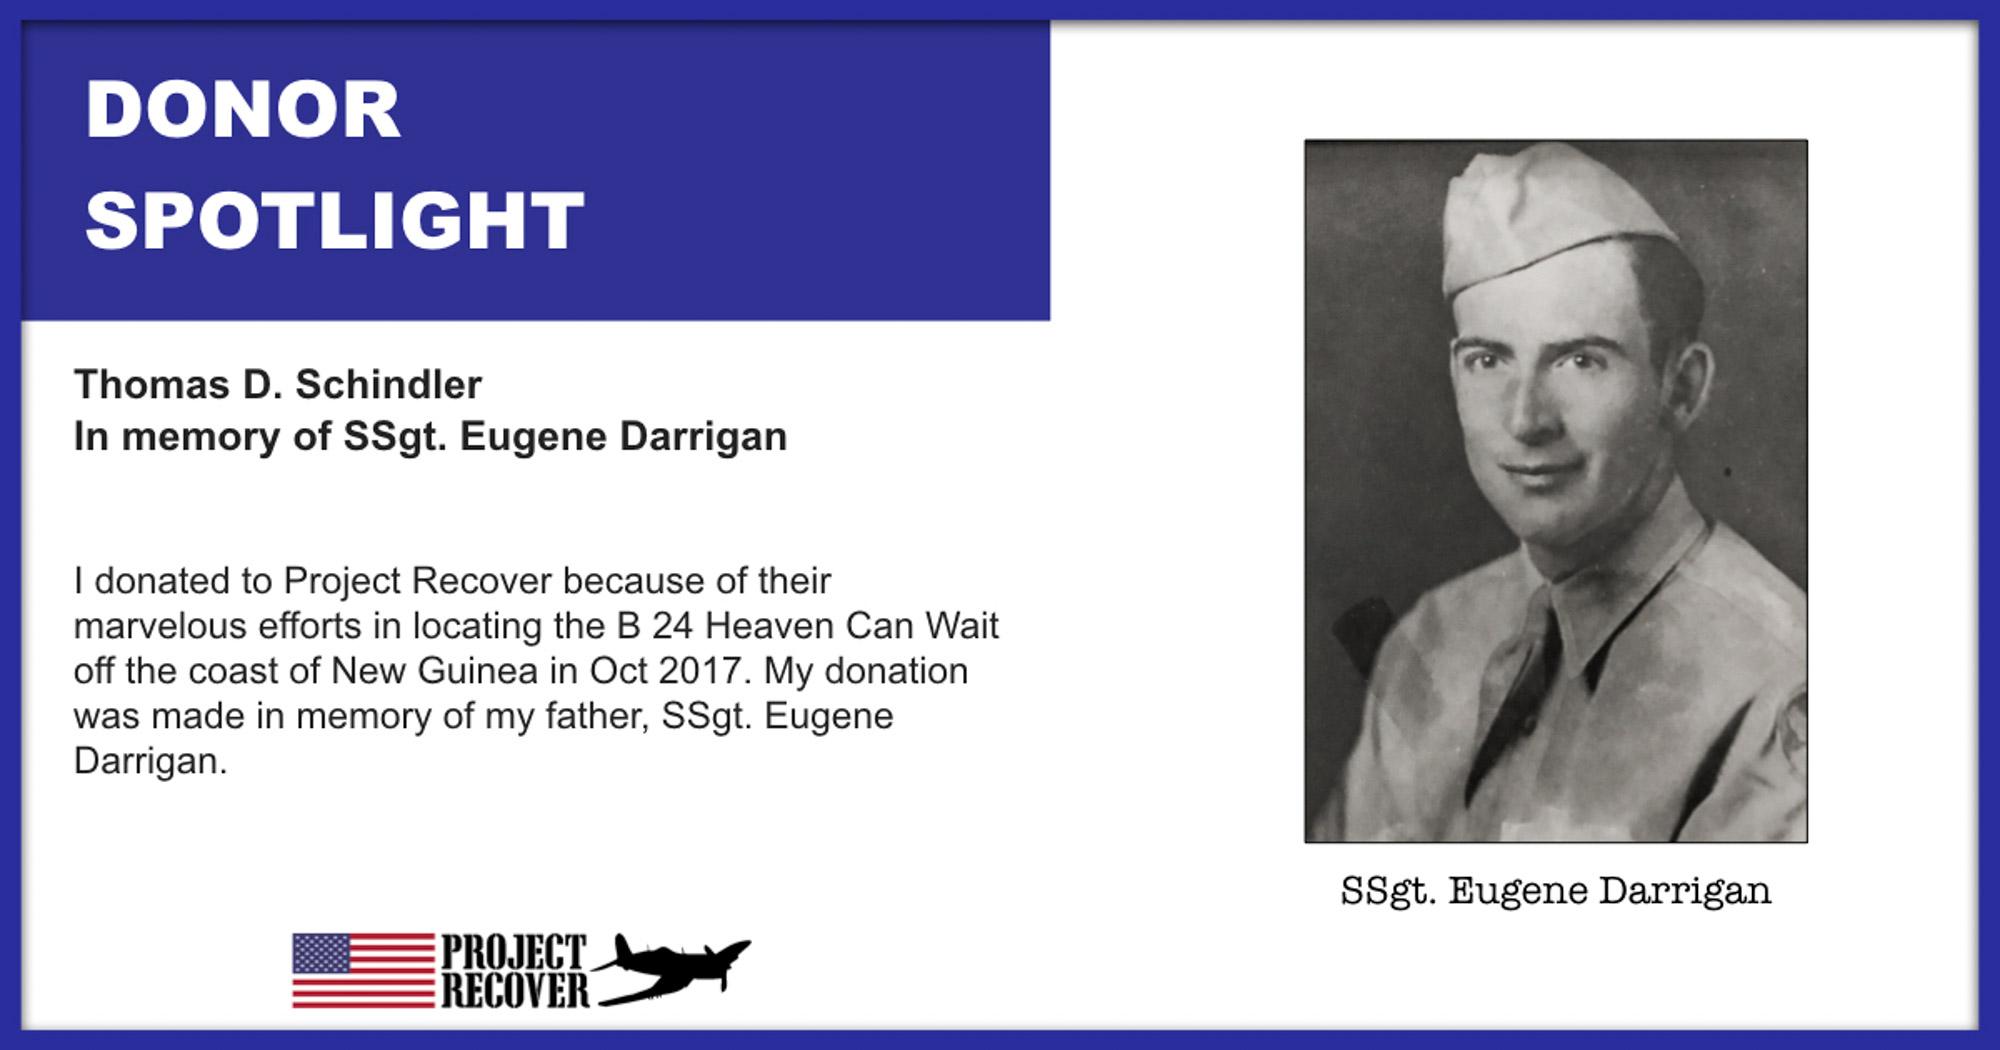 Donor Spotlight Thomas D. Schindler In Memory of SSgt Eugene Darrigan